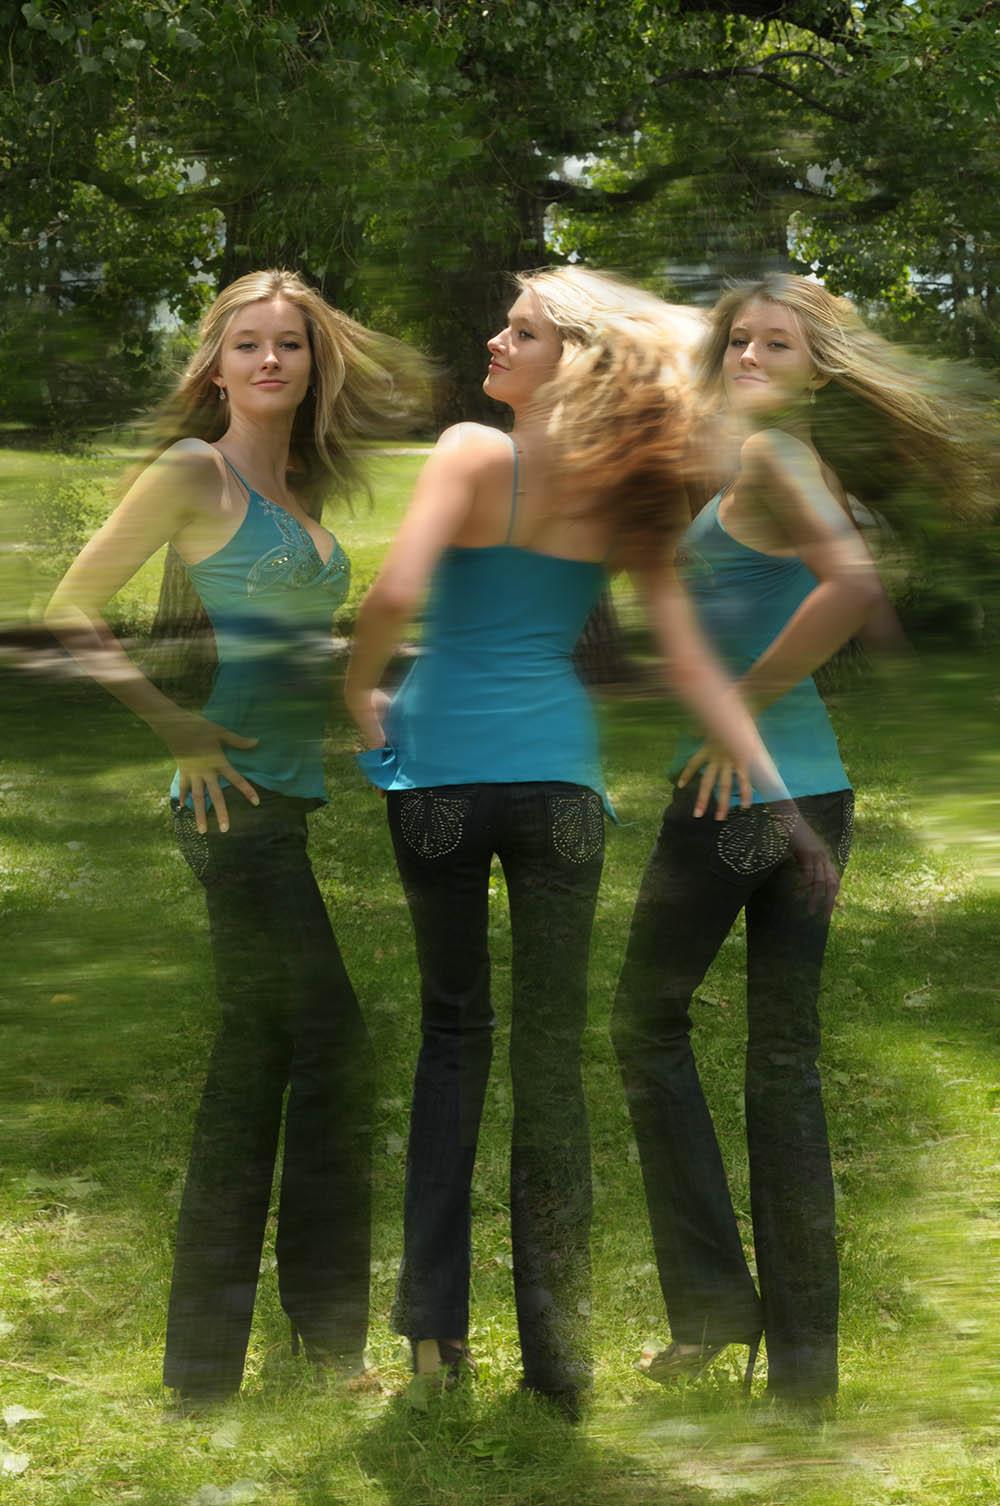 Multiple exposure jeans fashion photo